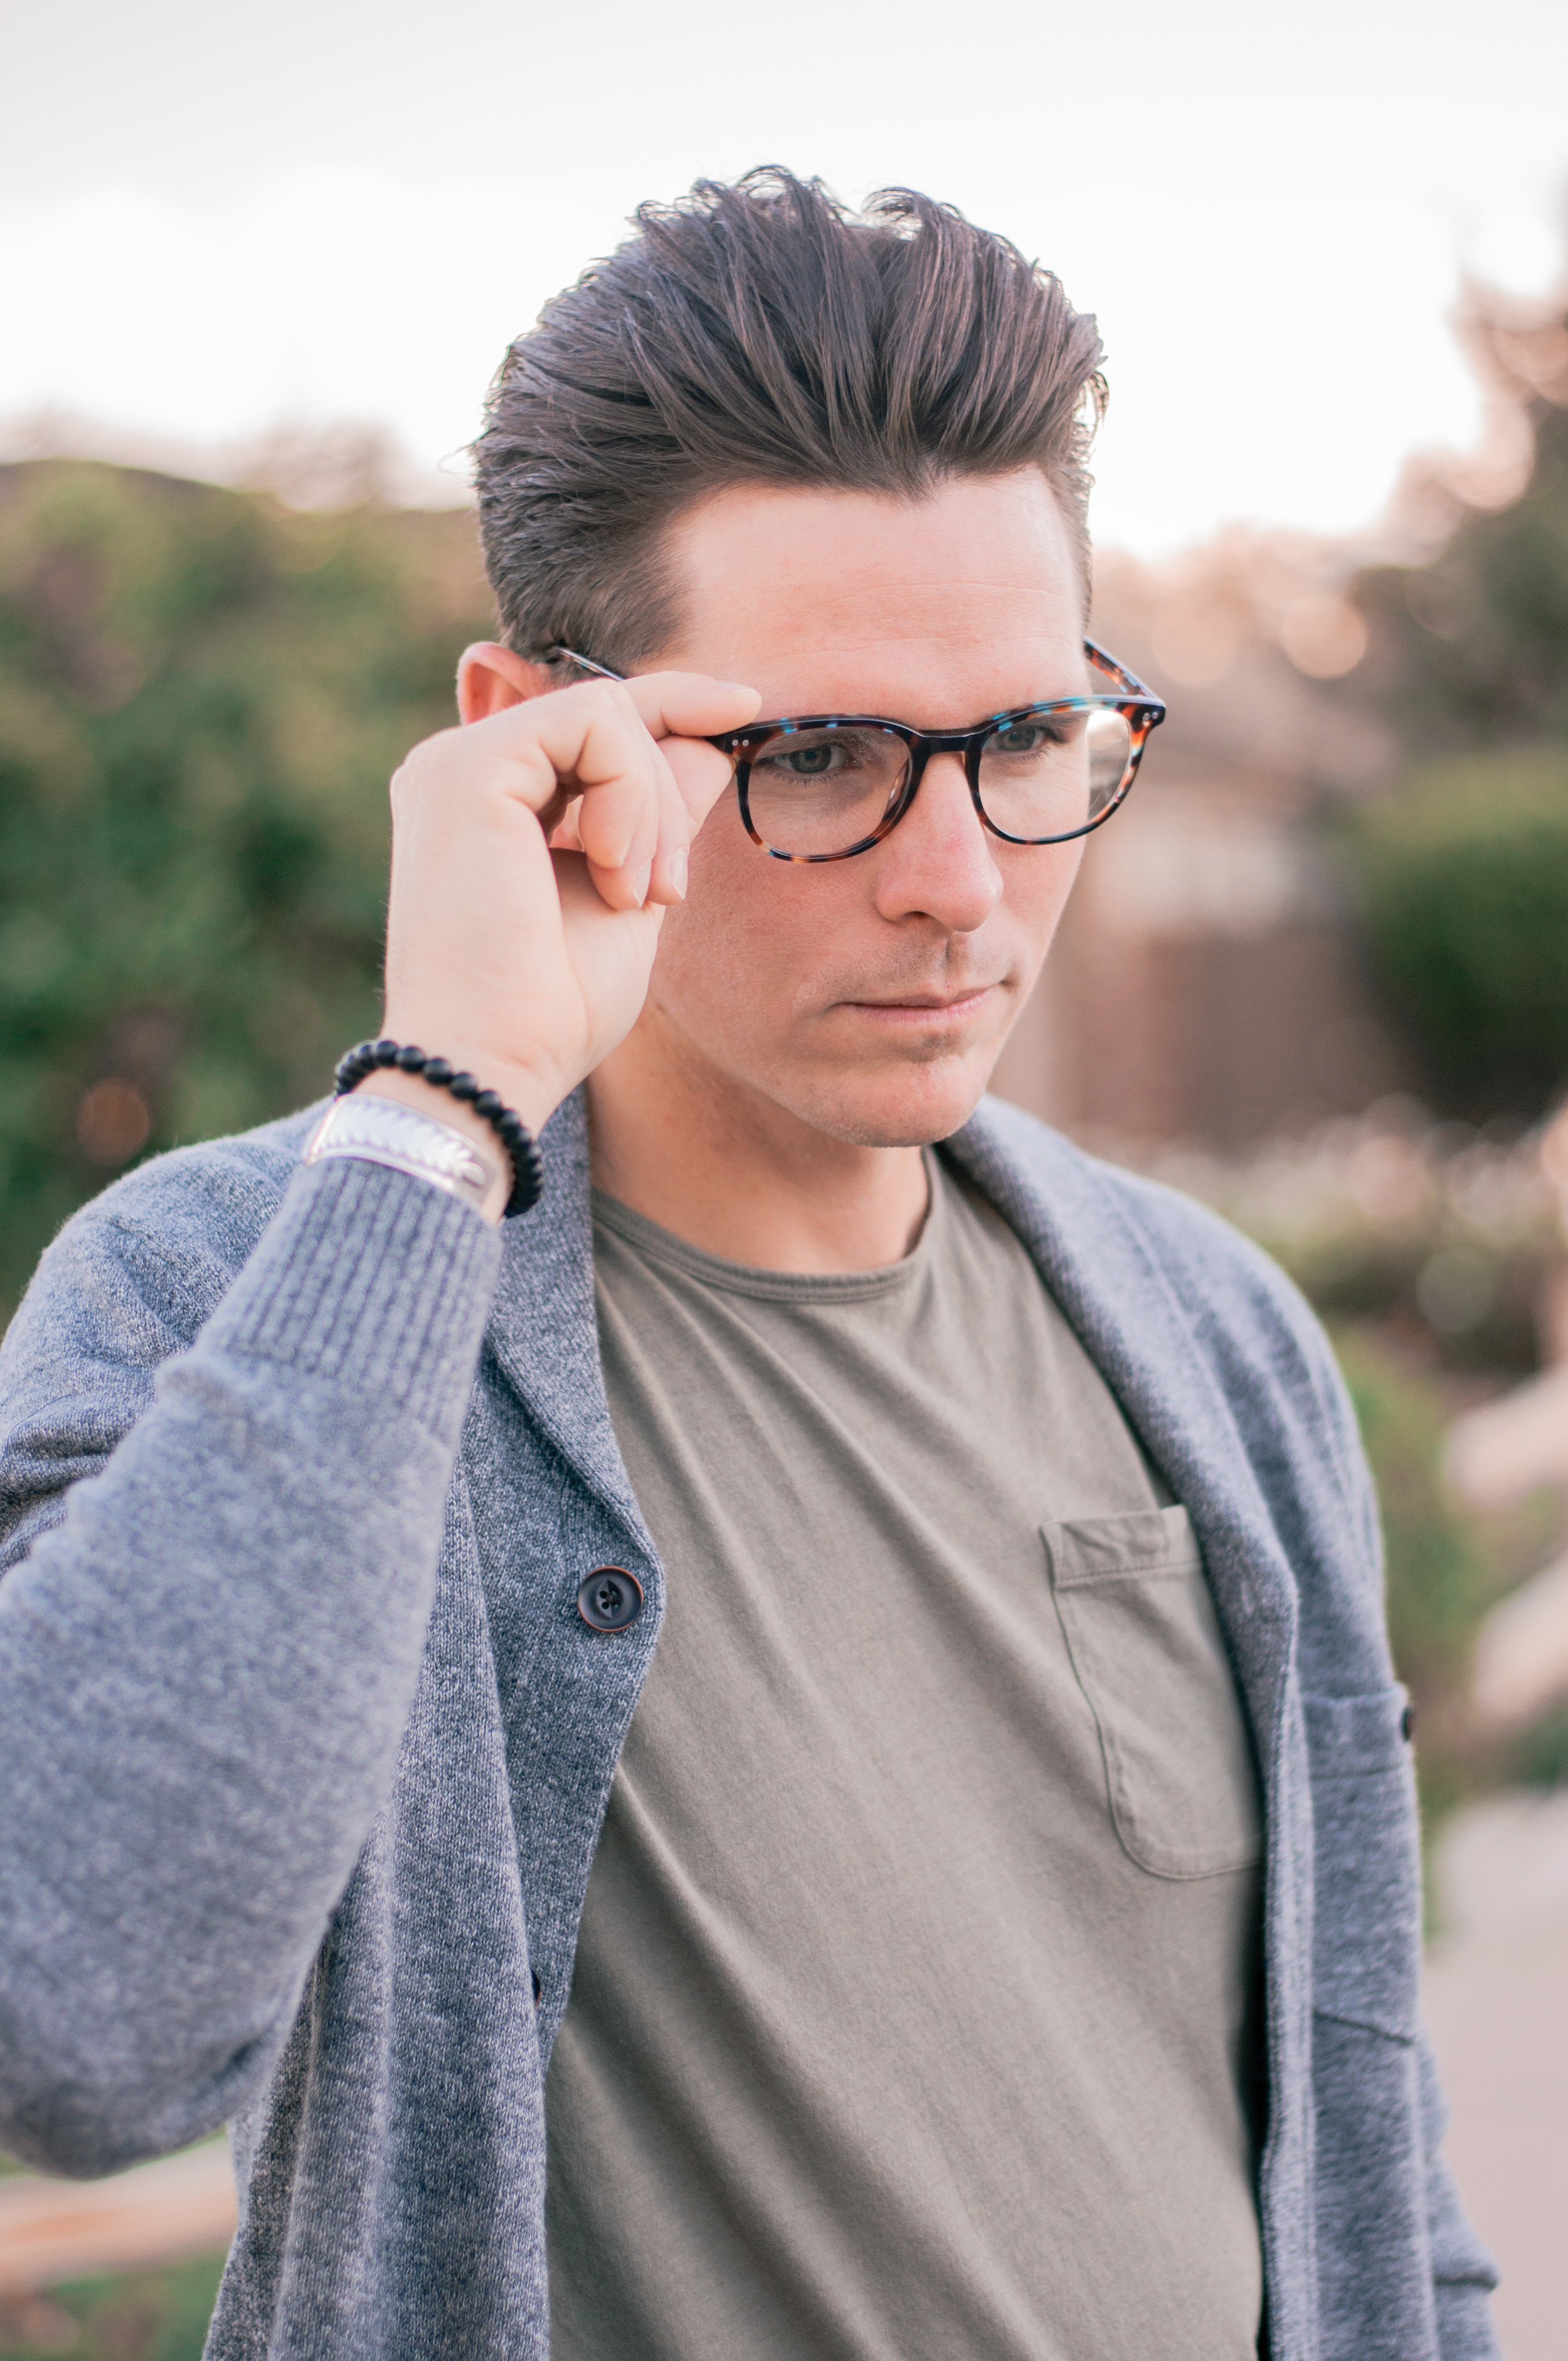 The best affordable prescription eyeglasses online for men